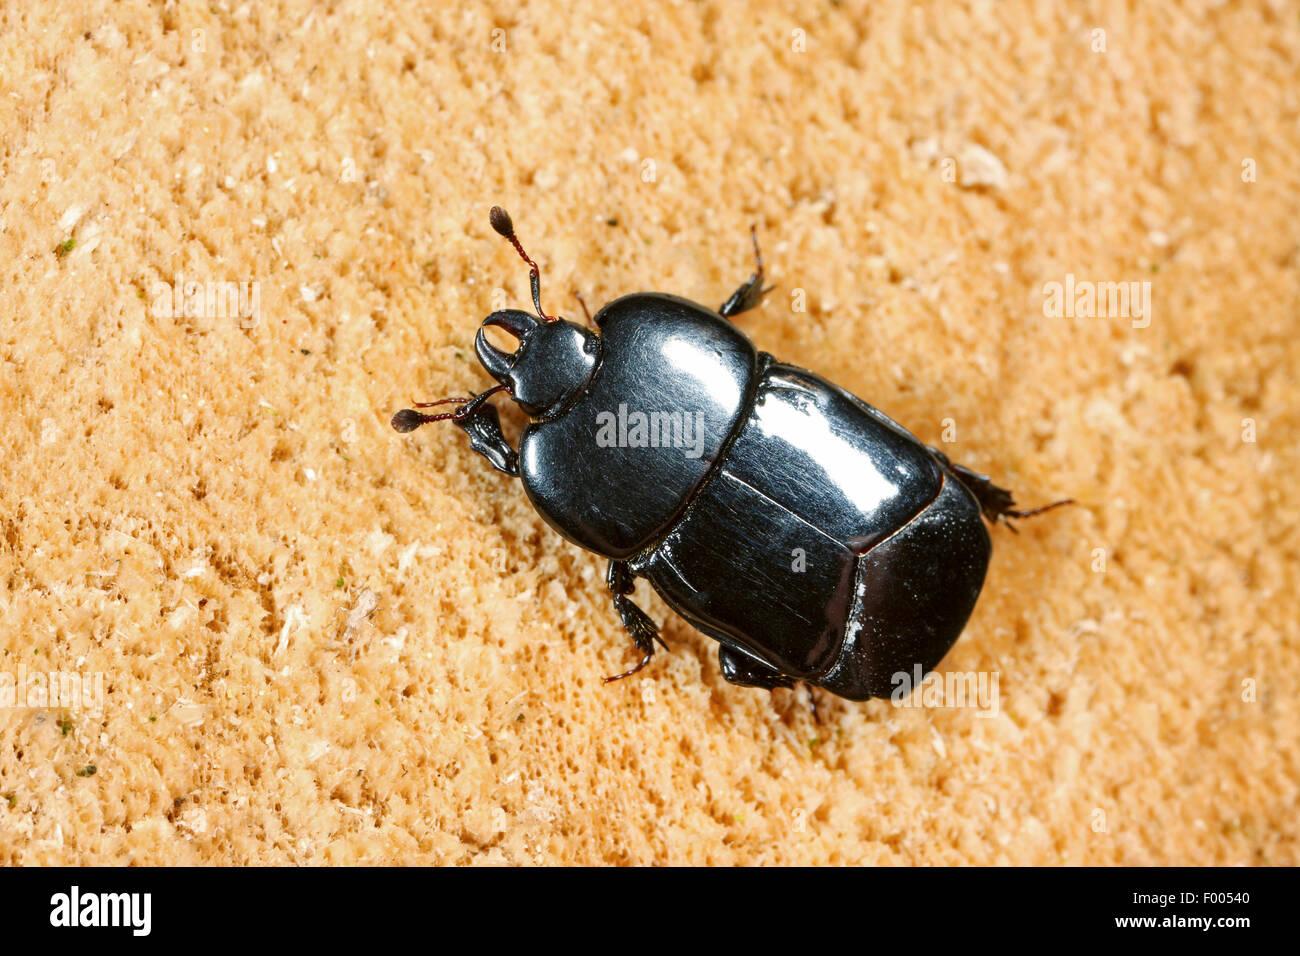 Imiter beetle (Hololepta plana), sur bois, Allemagne Photo Stock